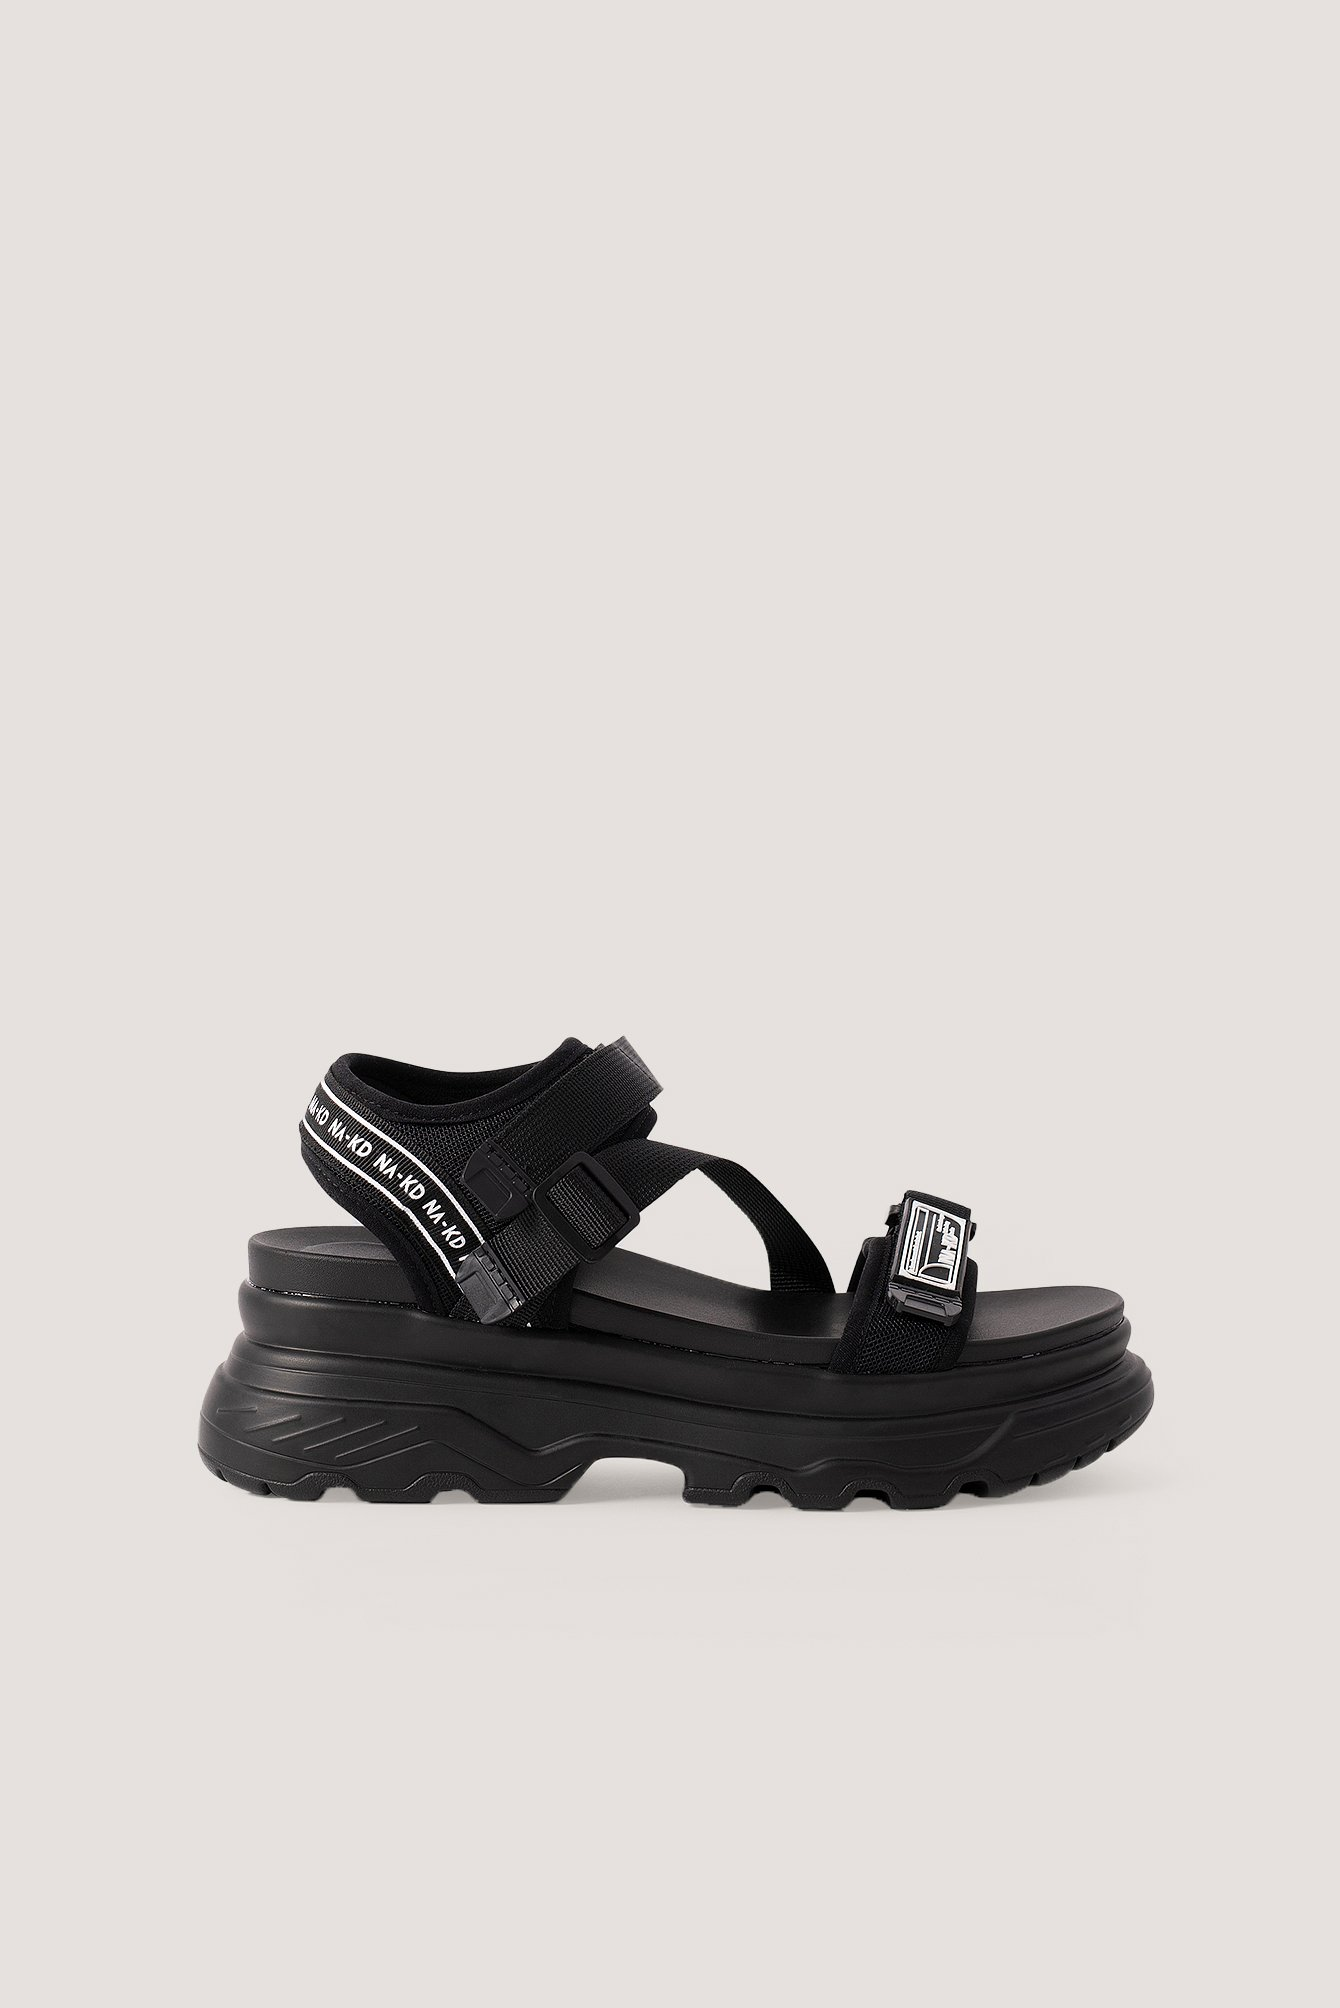 NA-KD Shoes Chunky Velcro Sandals - Black